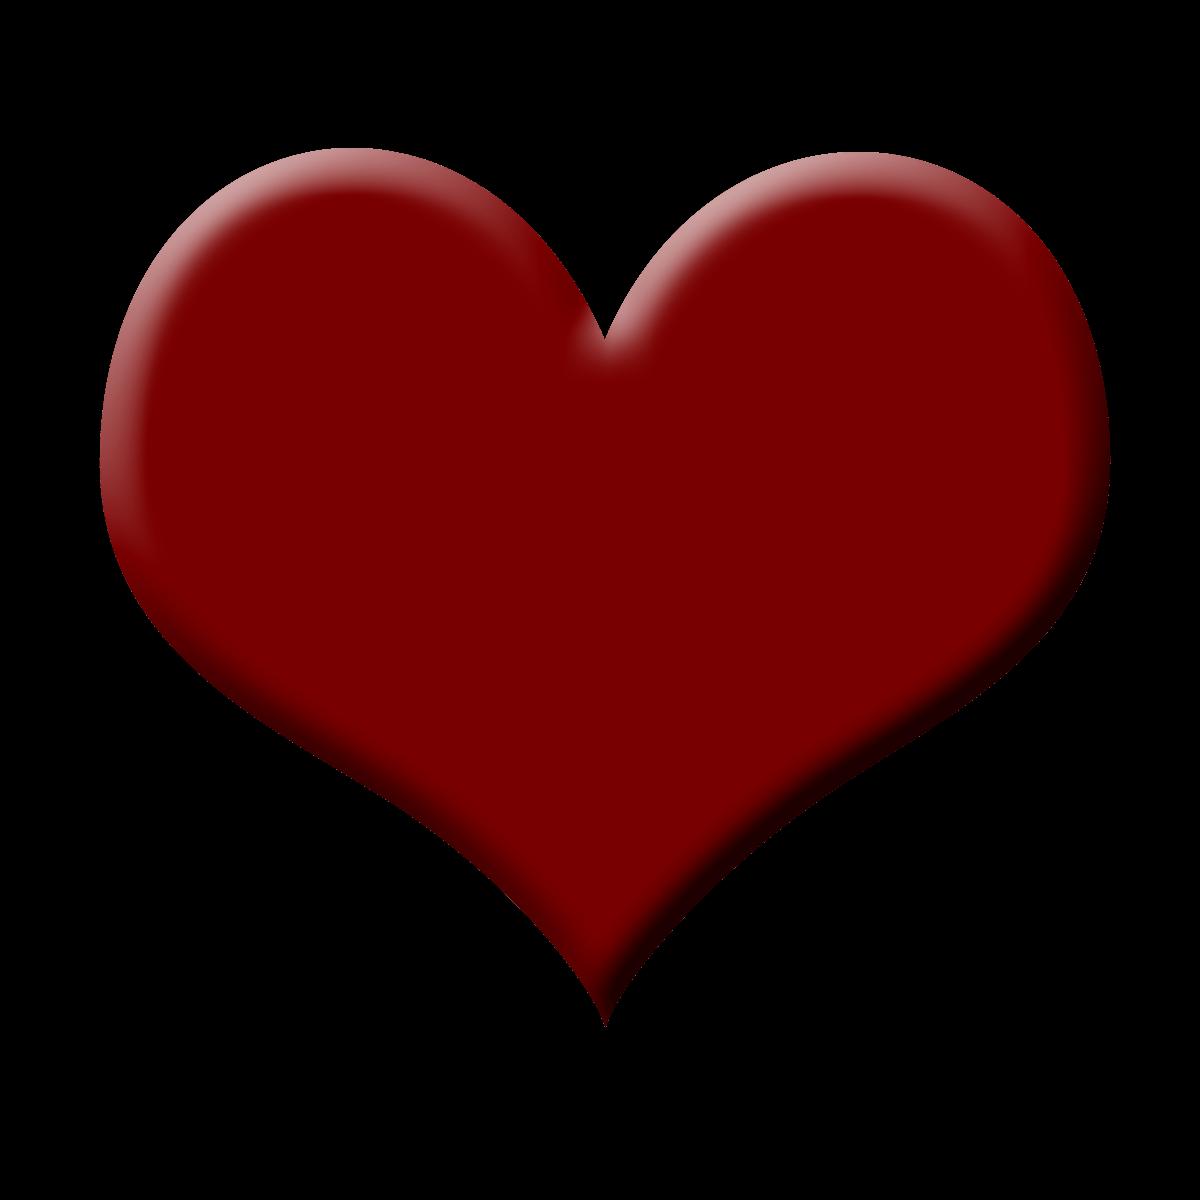 Heart clipart real clip art stock Medical Heart Clipart | Free download best Medical Heart Clipart on ... clip art stock